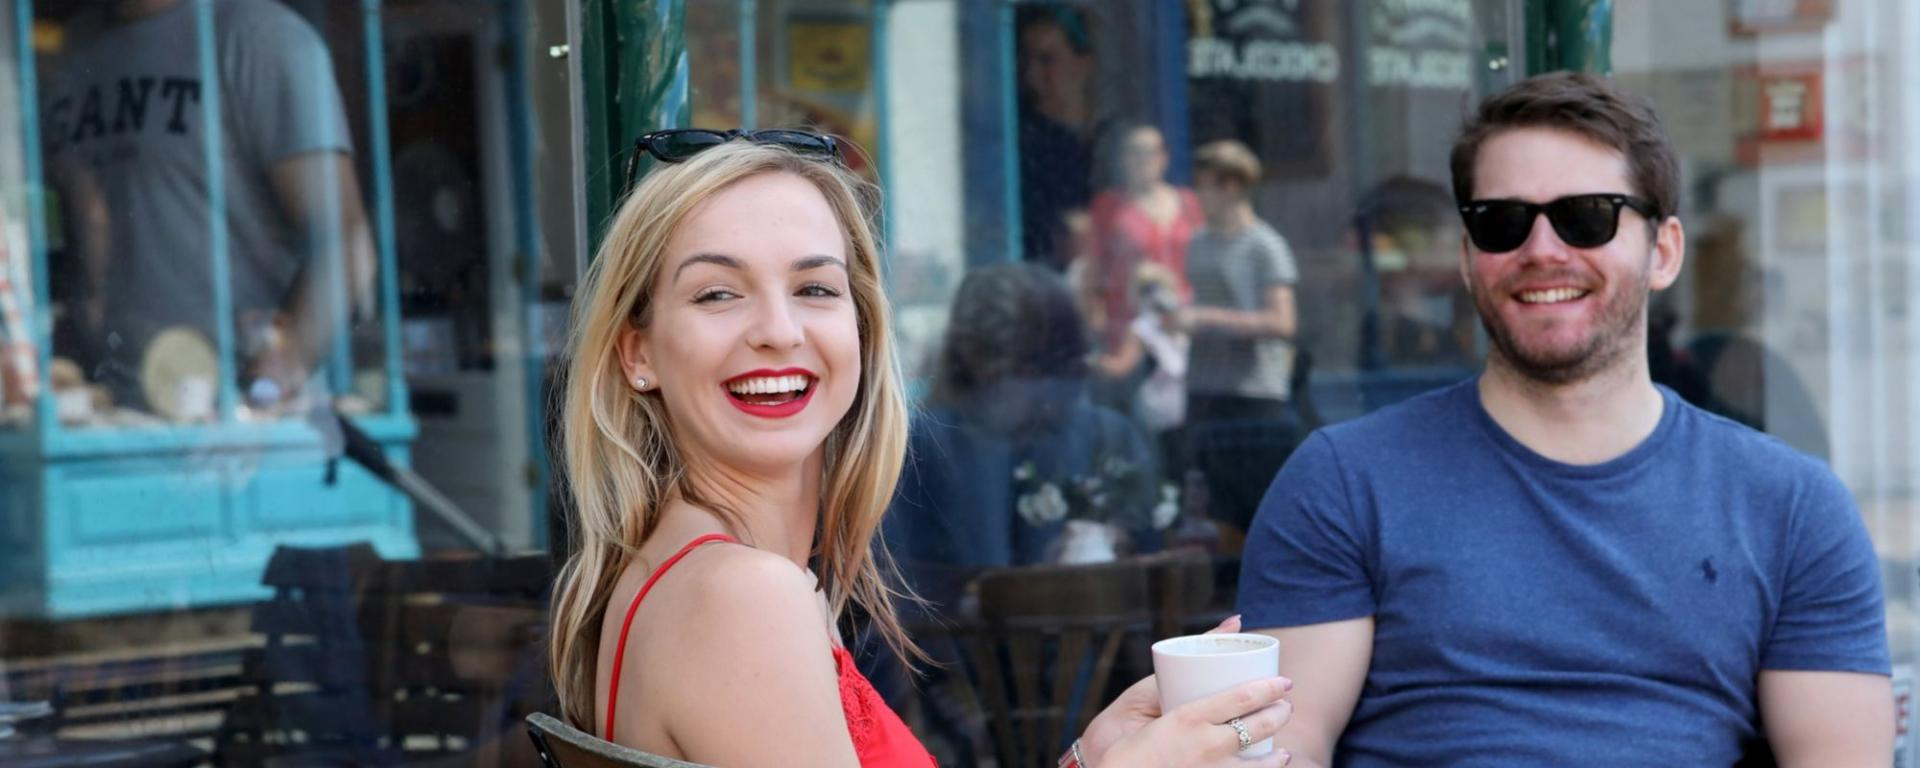 Couple Enjoying Tea And Coffee Outside Of The Tea Room On The Victorian Street